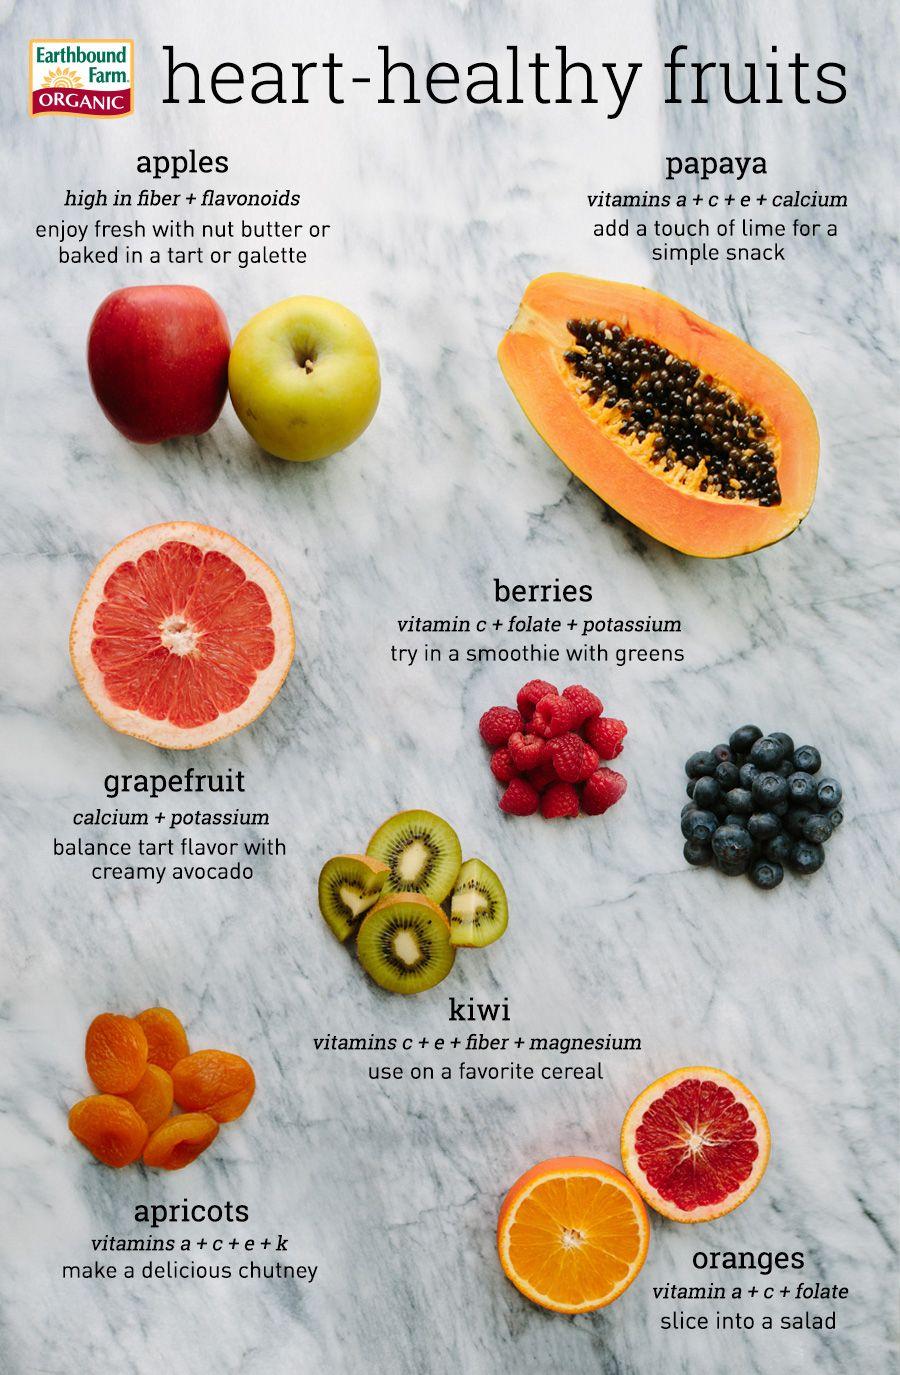 Heart-Healthy Fruits, Healthy Heart Month | Earthbound Farm Organic